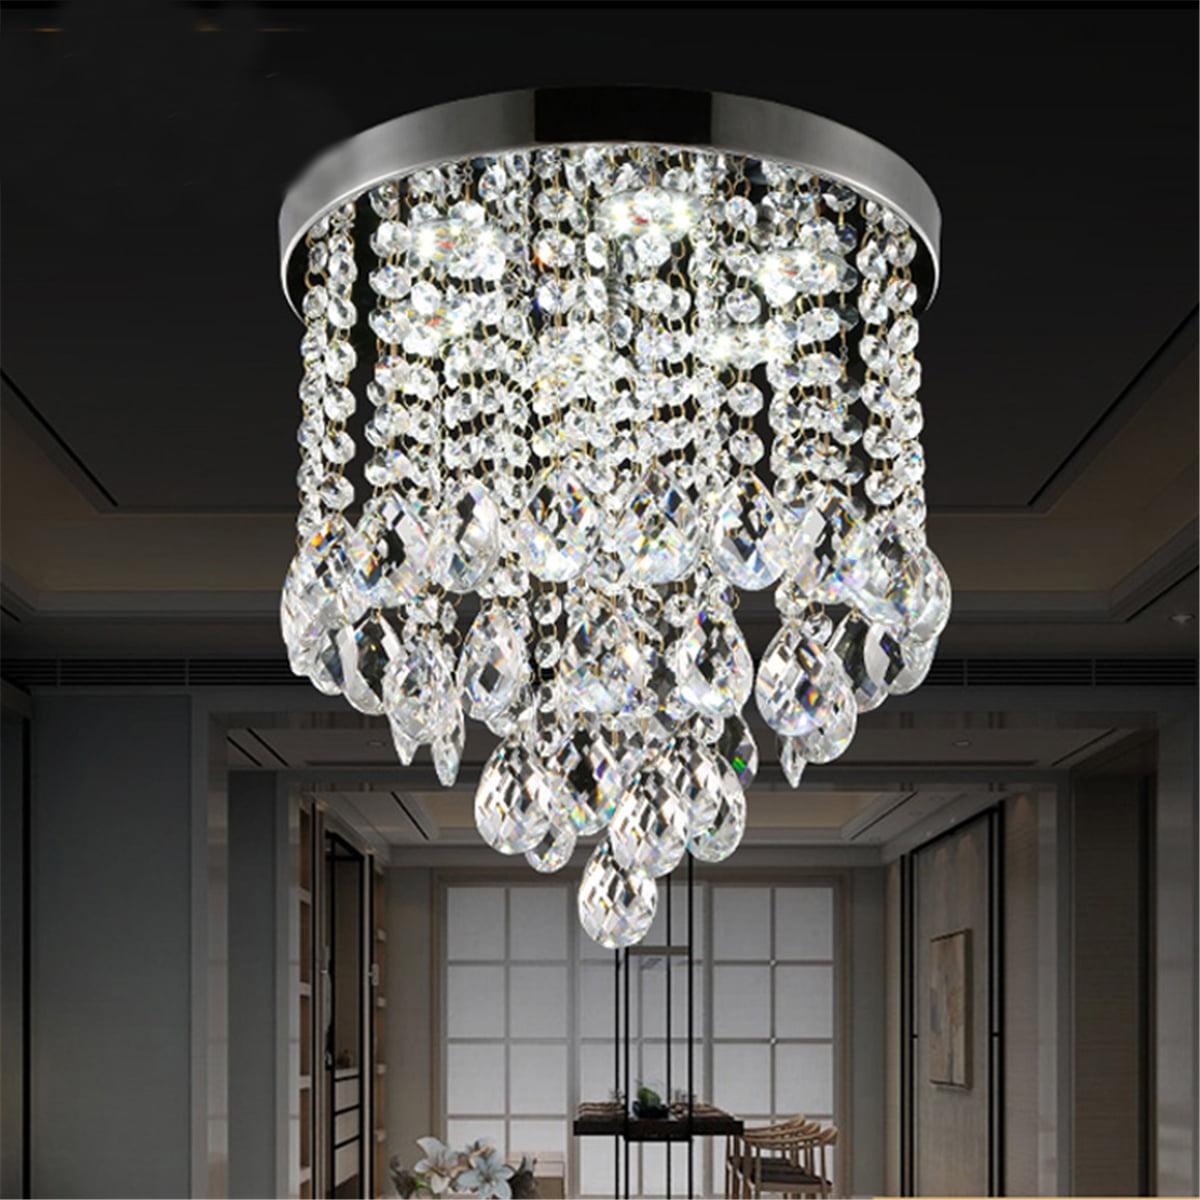 Ceiling Light Pendant Lamp Crystal Chandelier Lighting Fixture Home Decor Modern